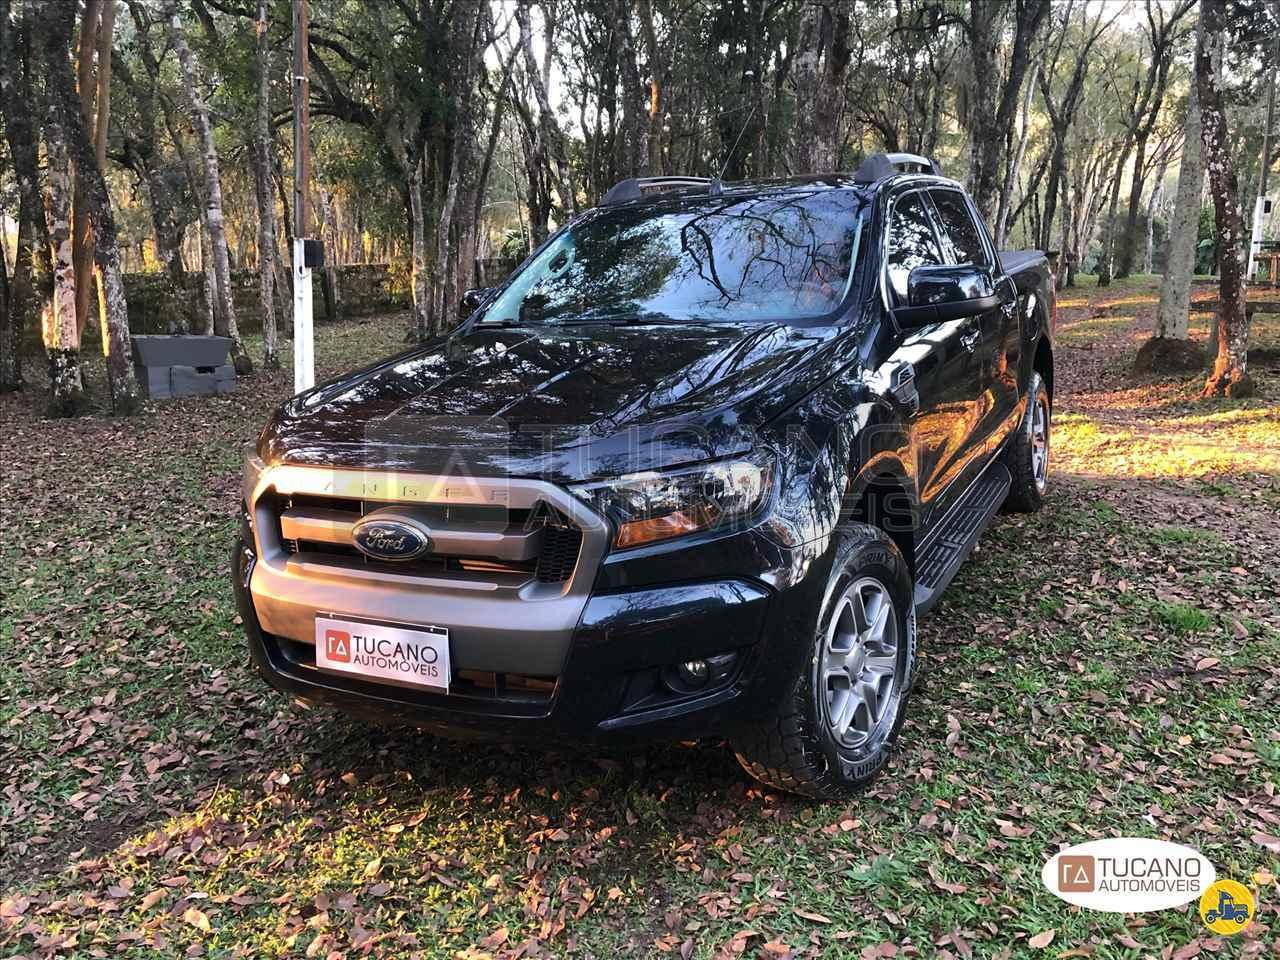 CARRO FORD Ranger XLS 2.2 CD Tucano Automóveis ALFREDO WAGNER SANTA CATARINA SC